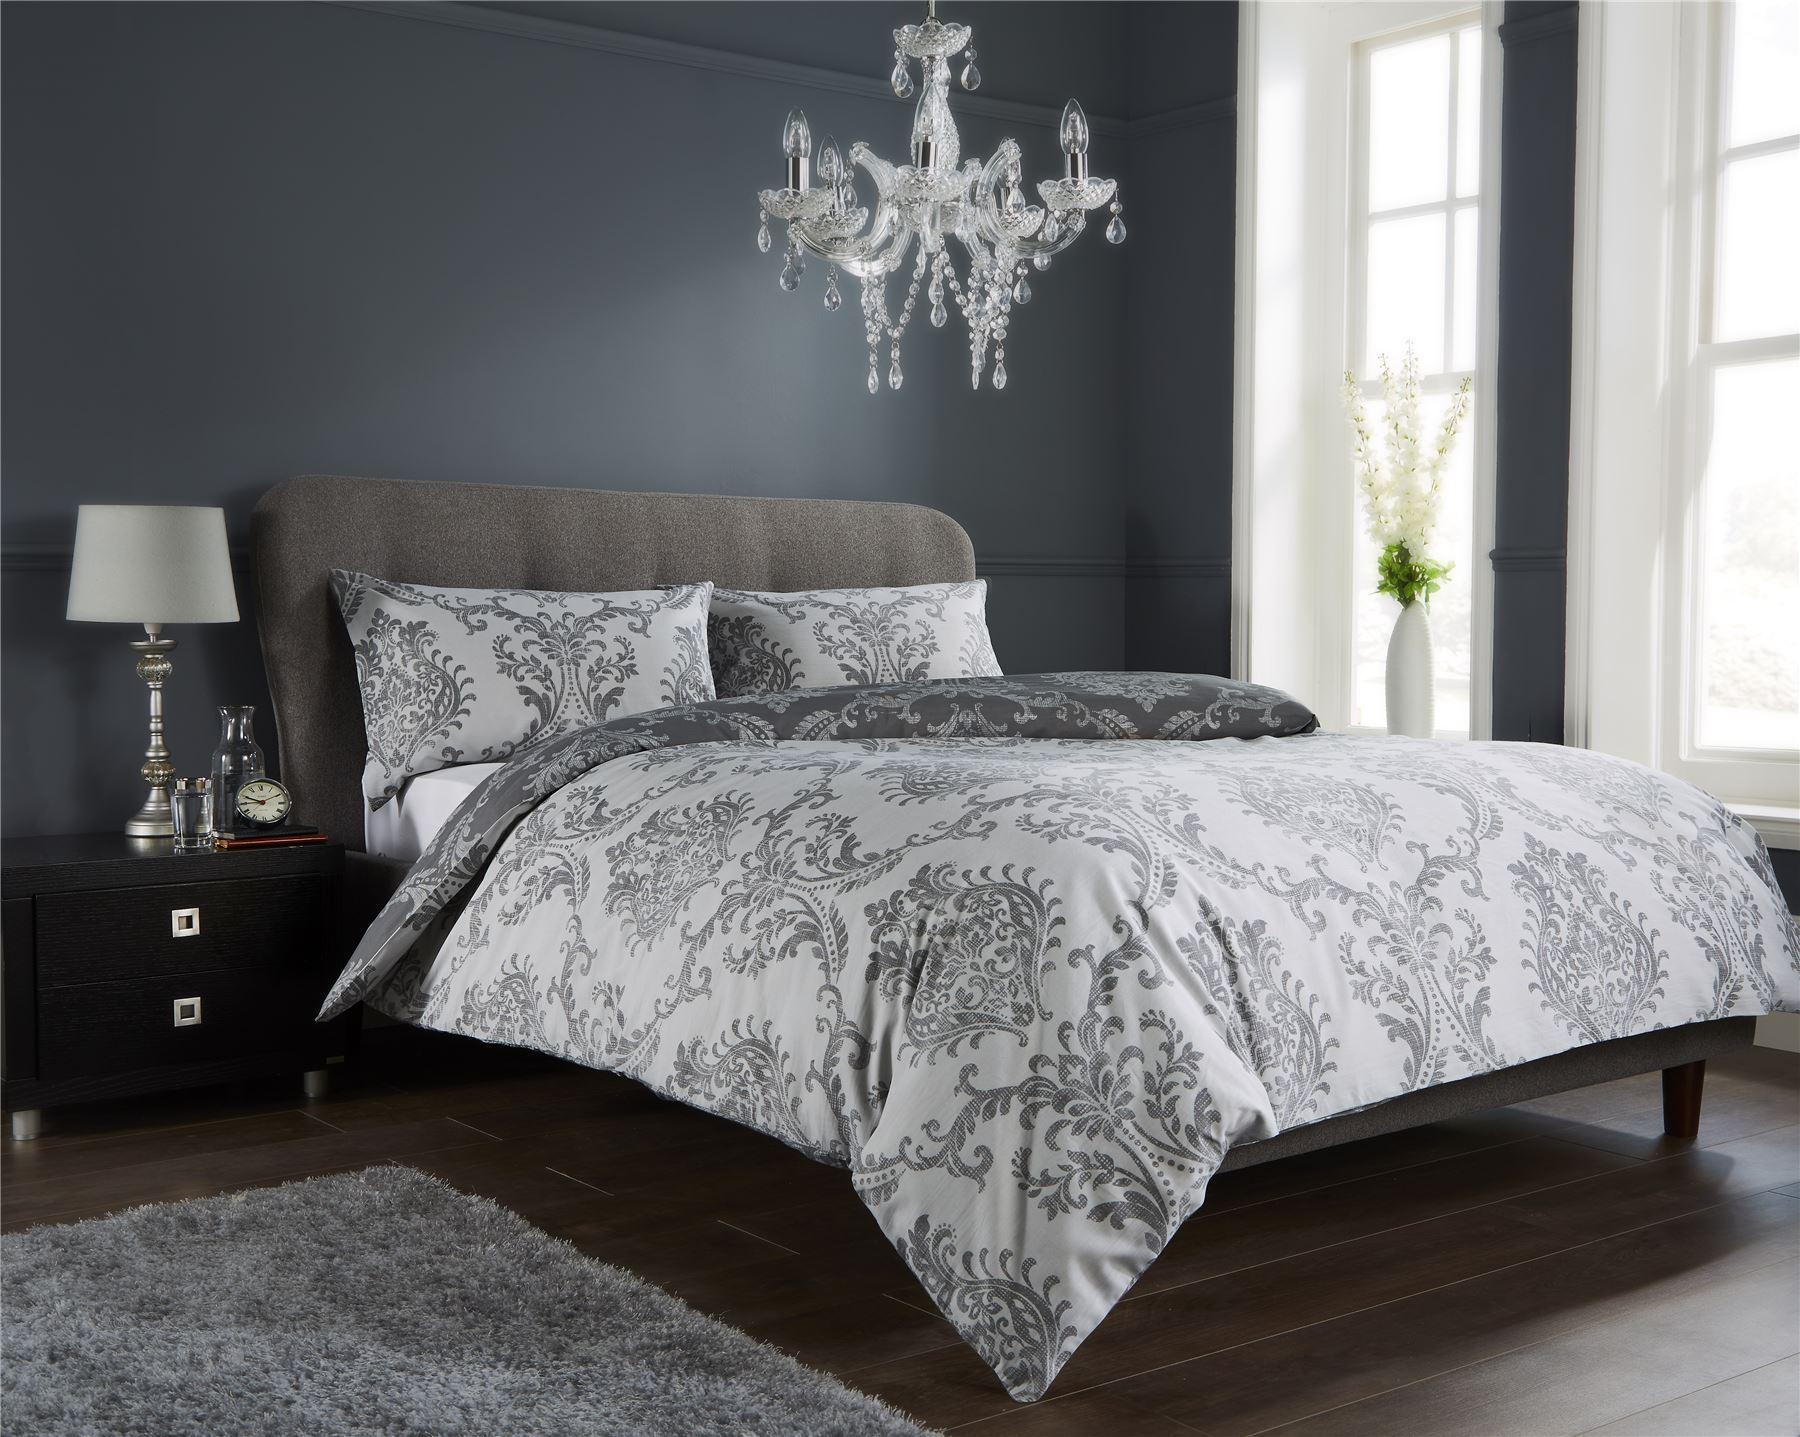 details about damask duvet quilt cover set bed linen double king size bedding black grey